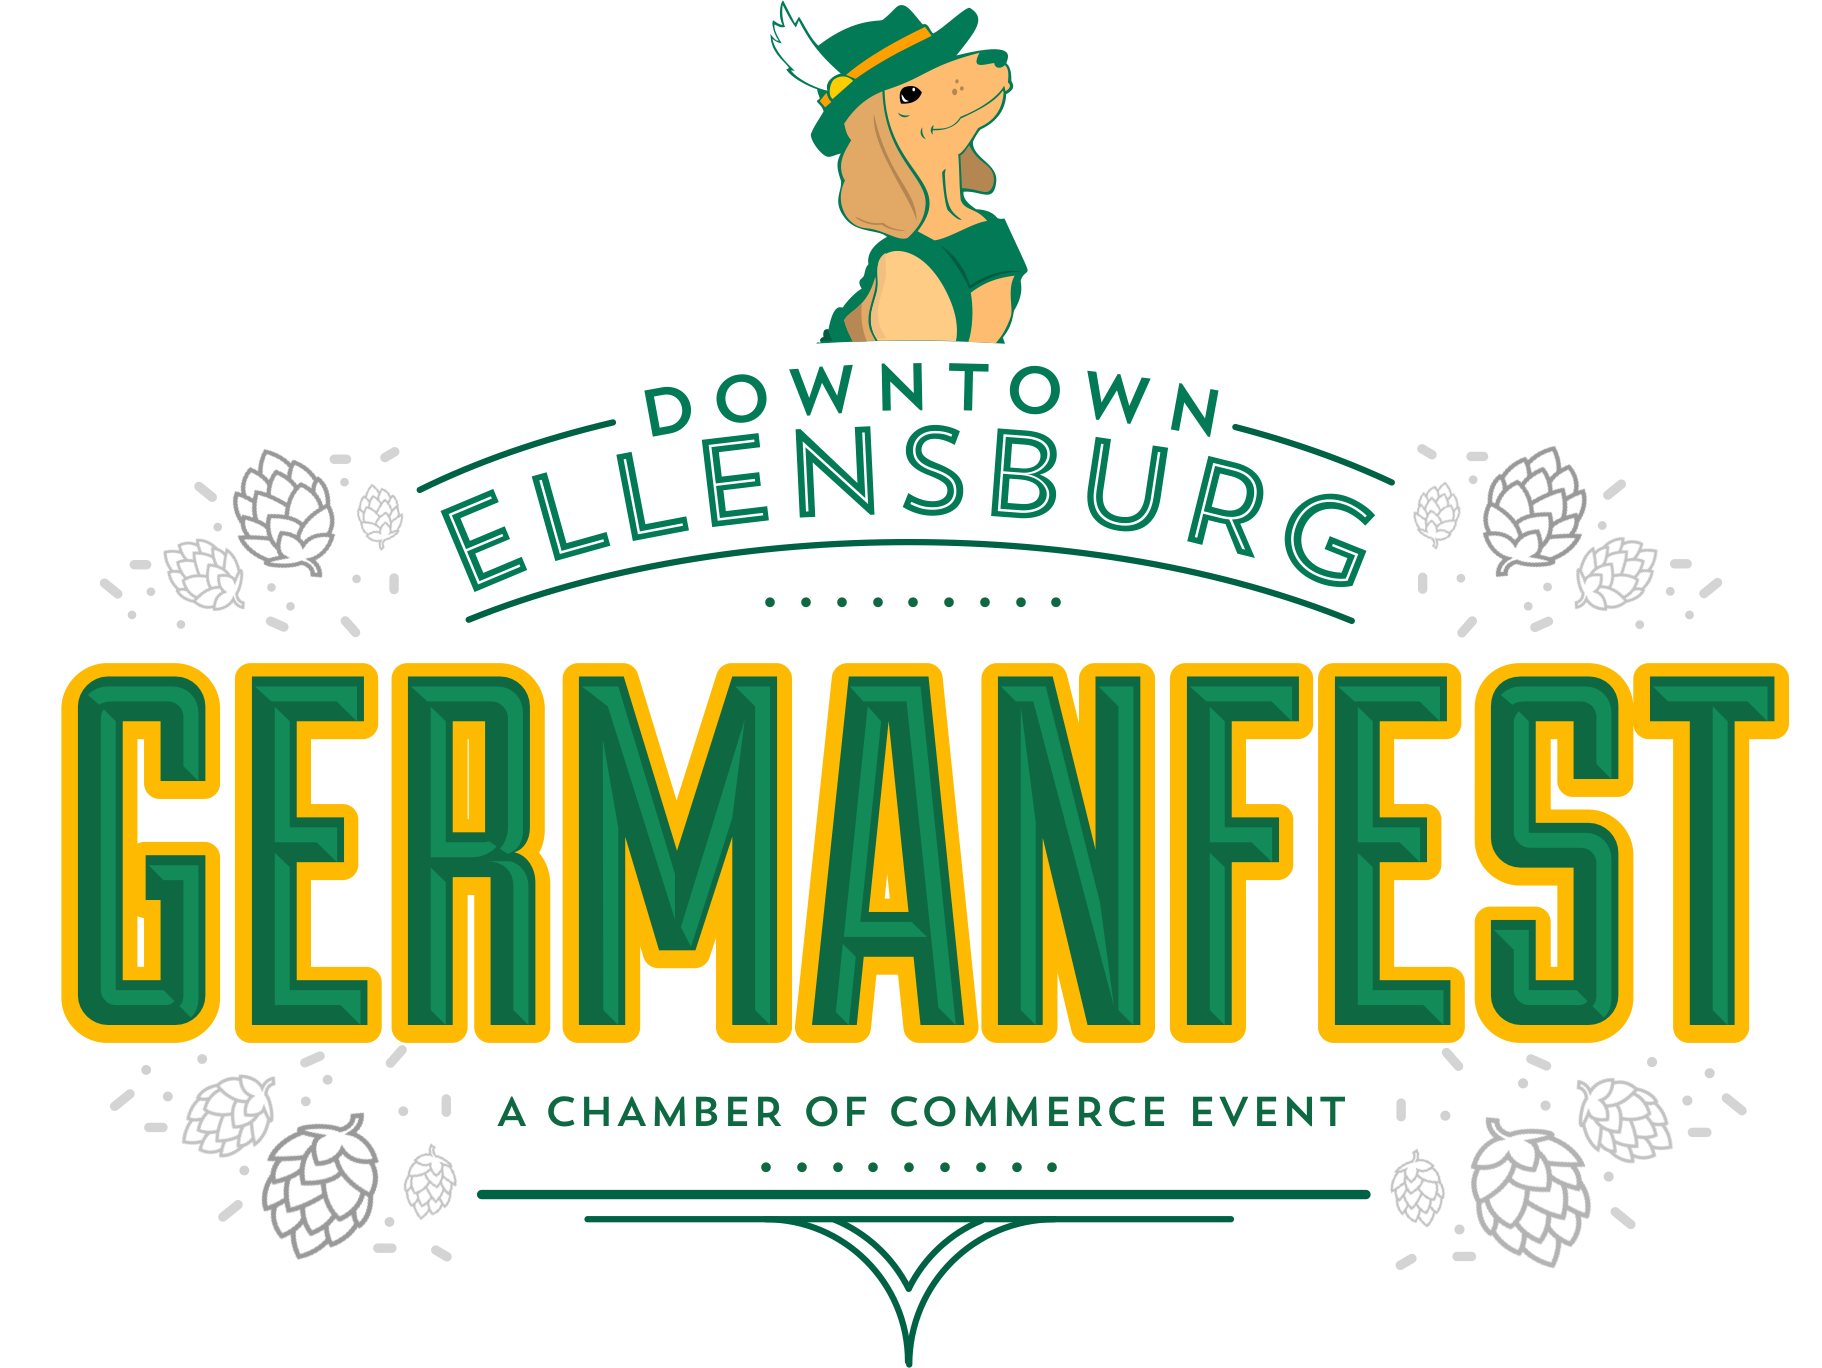 GermanFest Logo